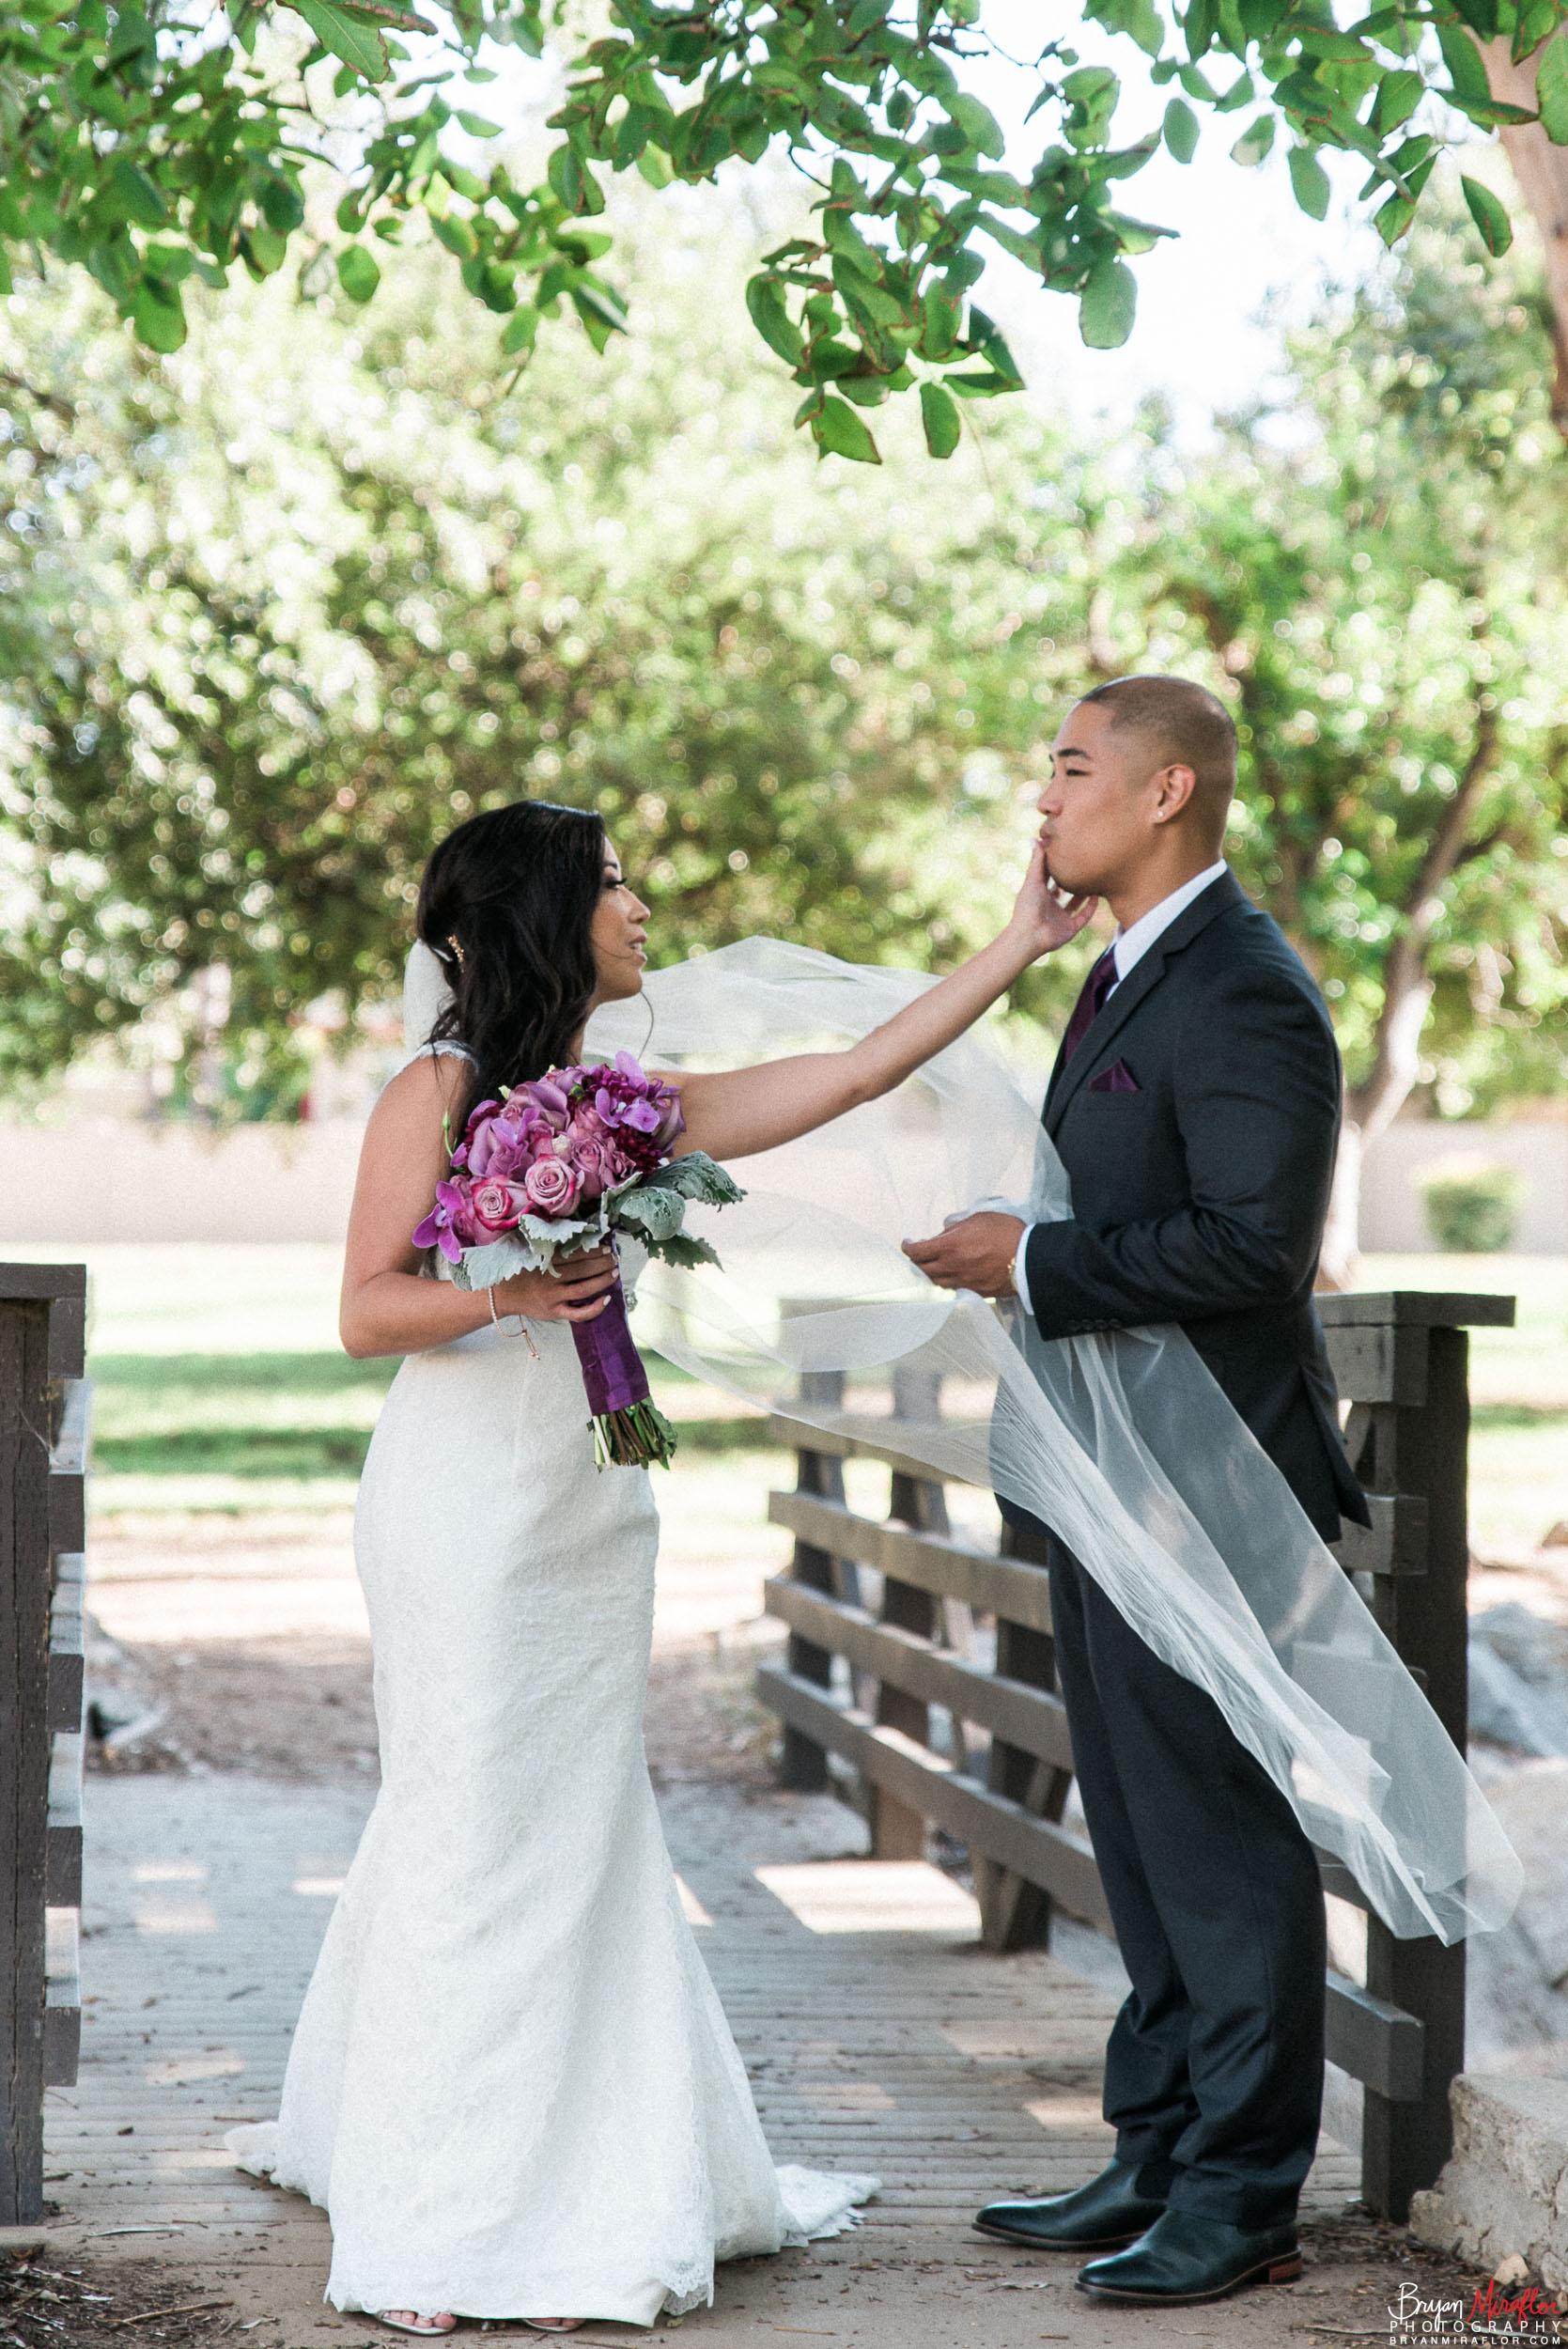 Bryan-Miraflor-Photography-Trisha-Dexter-Married-20170923-044.jpg